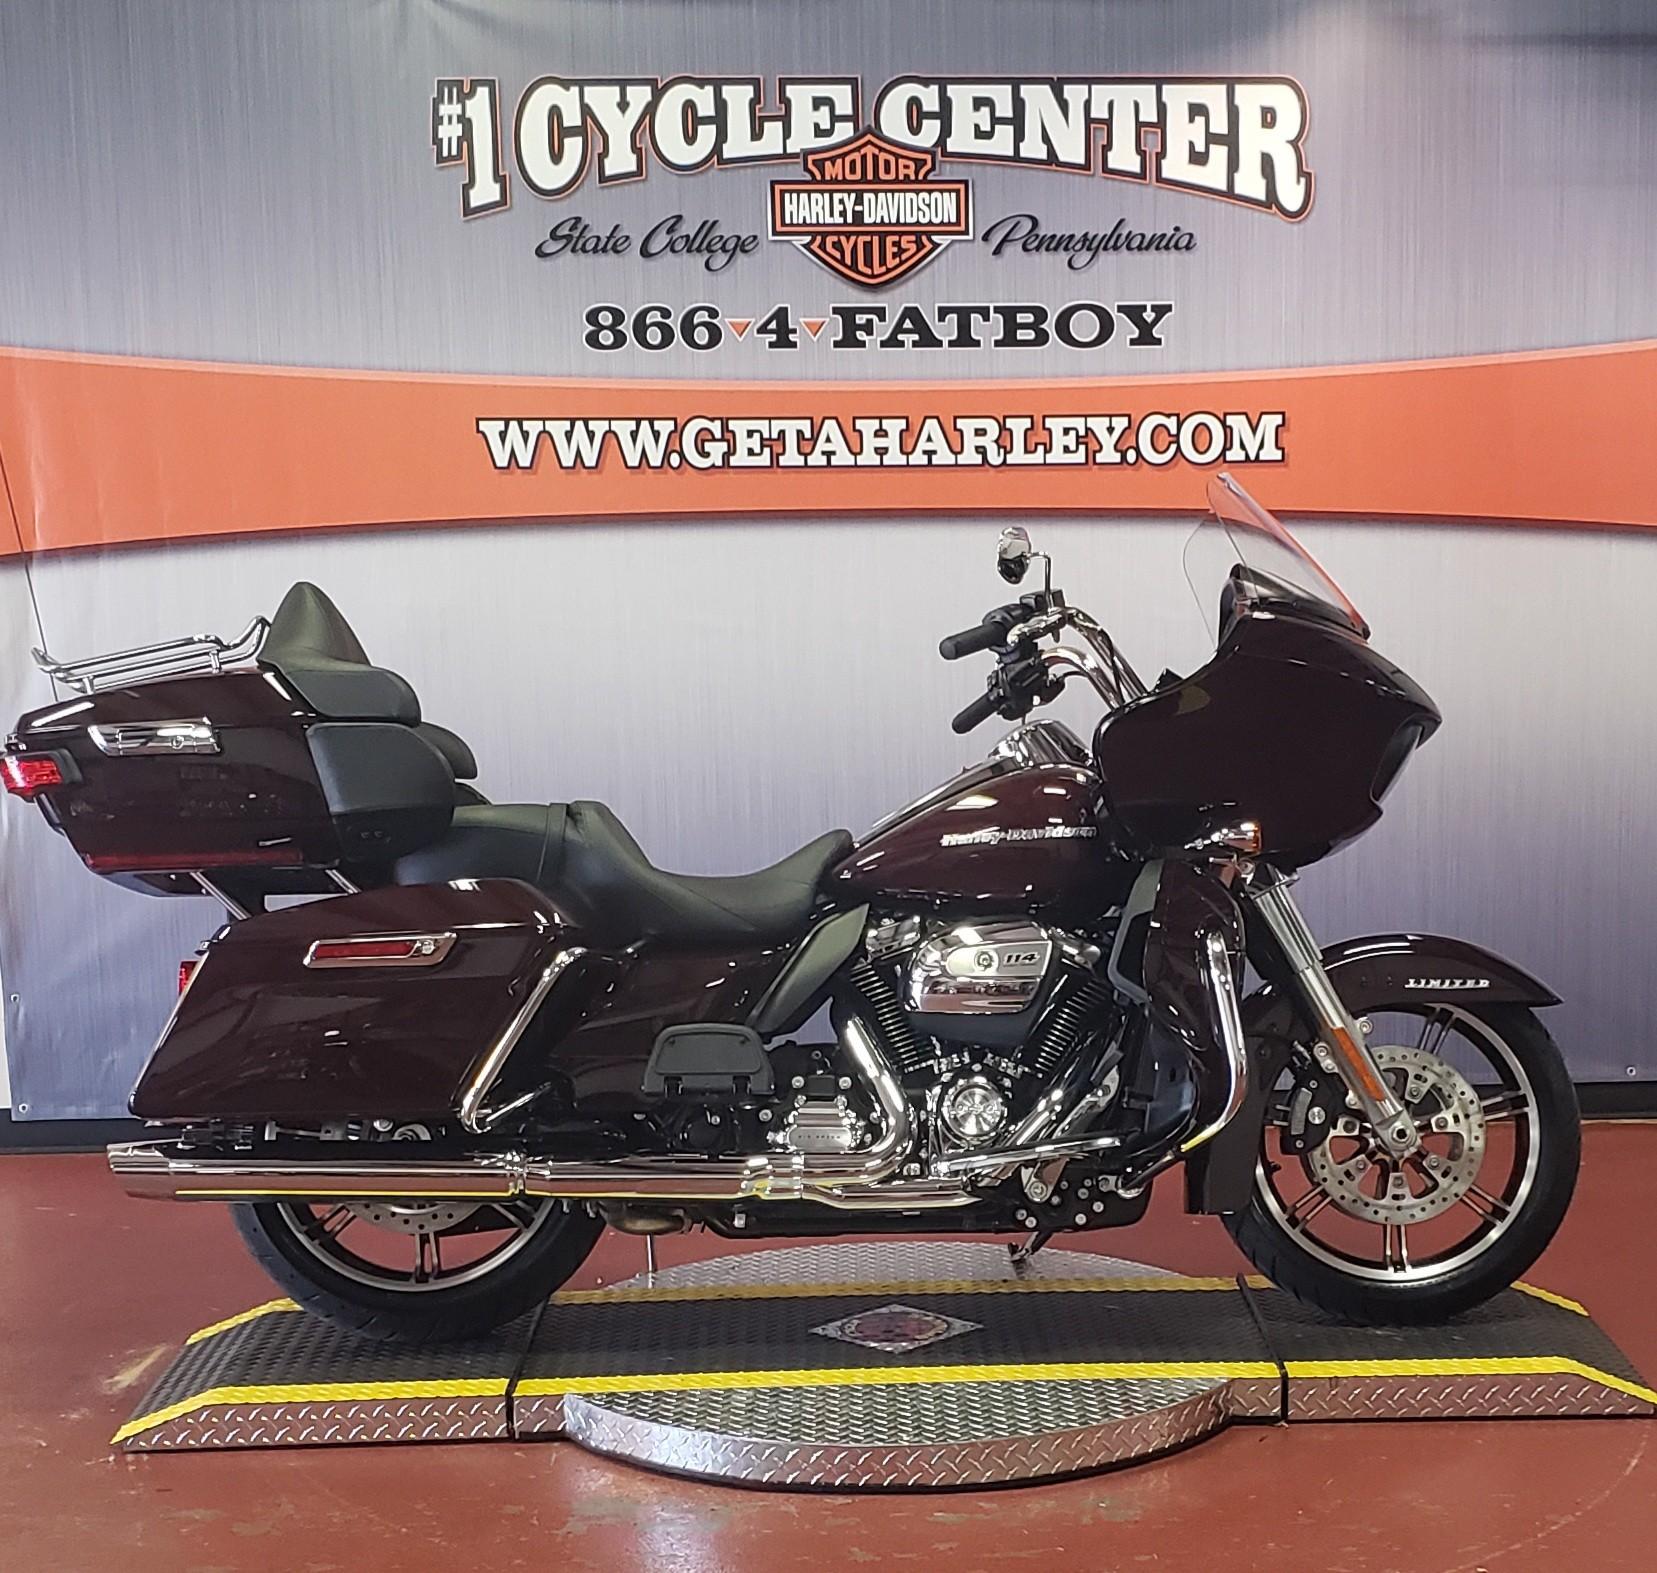 2021 Harley-Davidson FLTRK at #1 Cycle Center Harley-Davidson